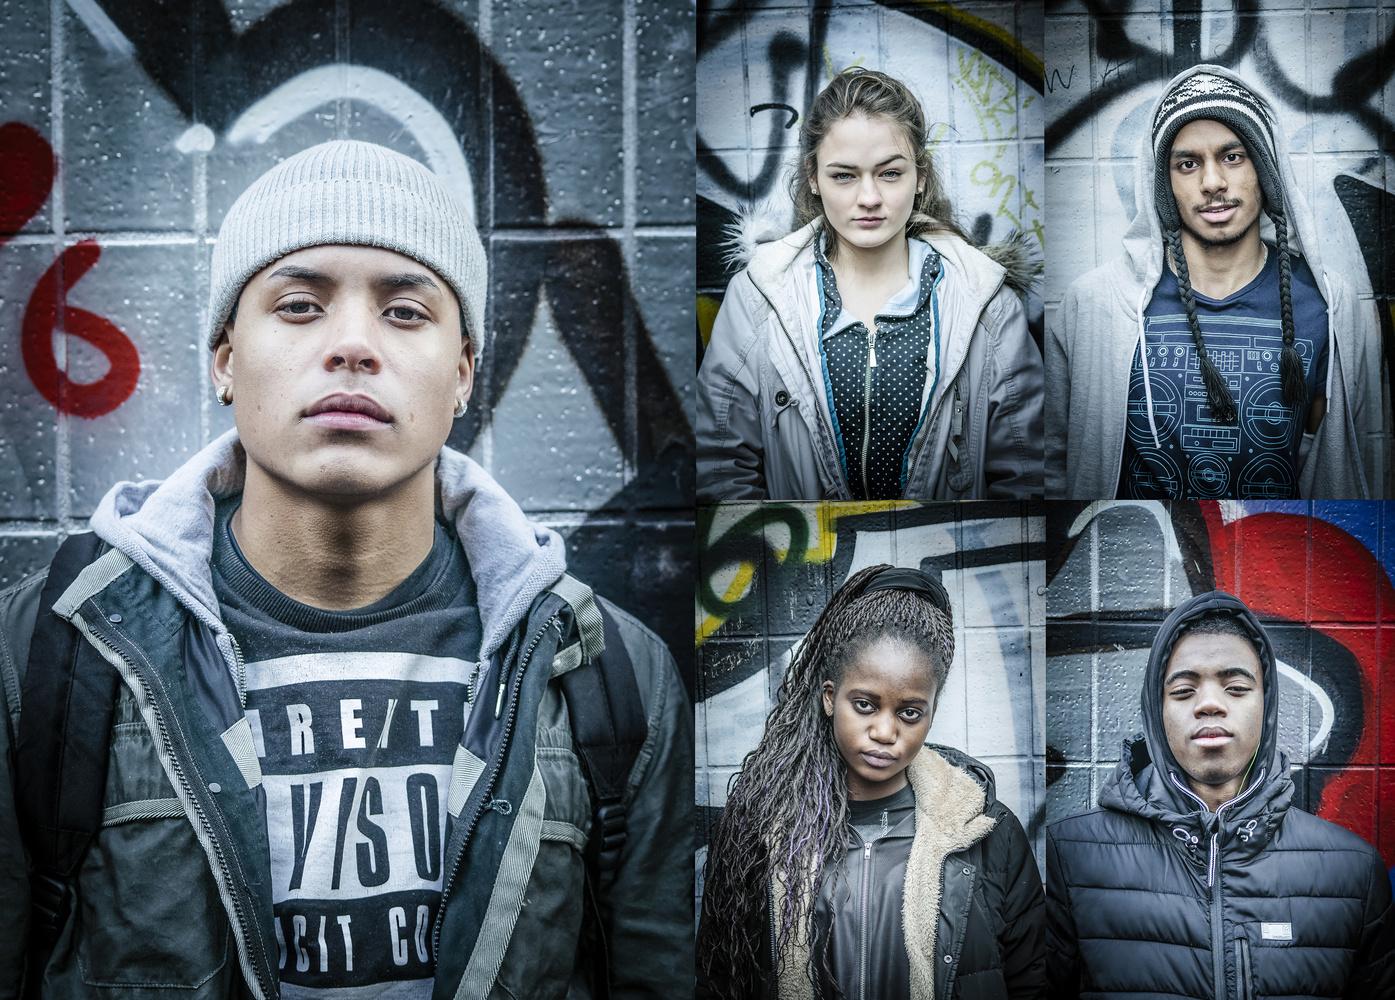 Urban portraits by Chris Doyle